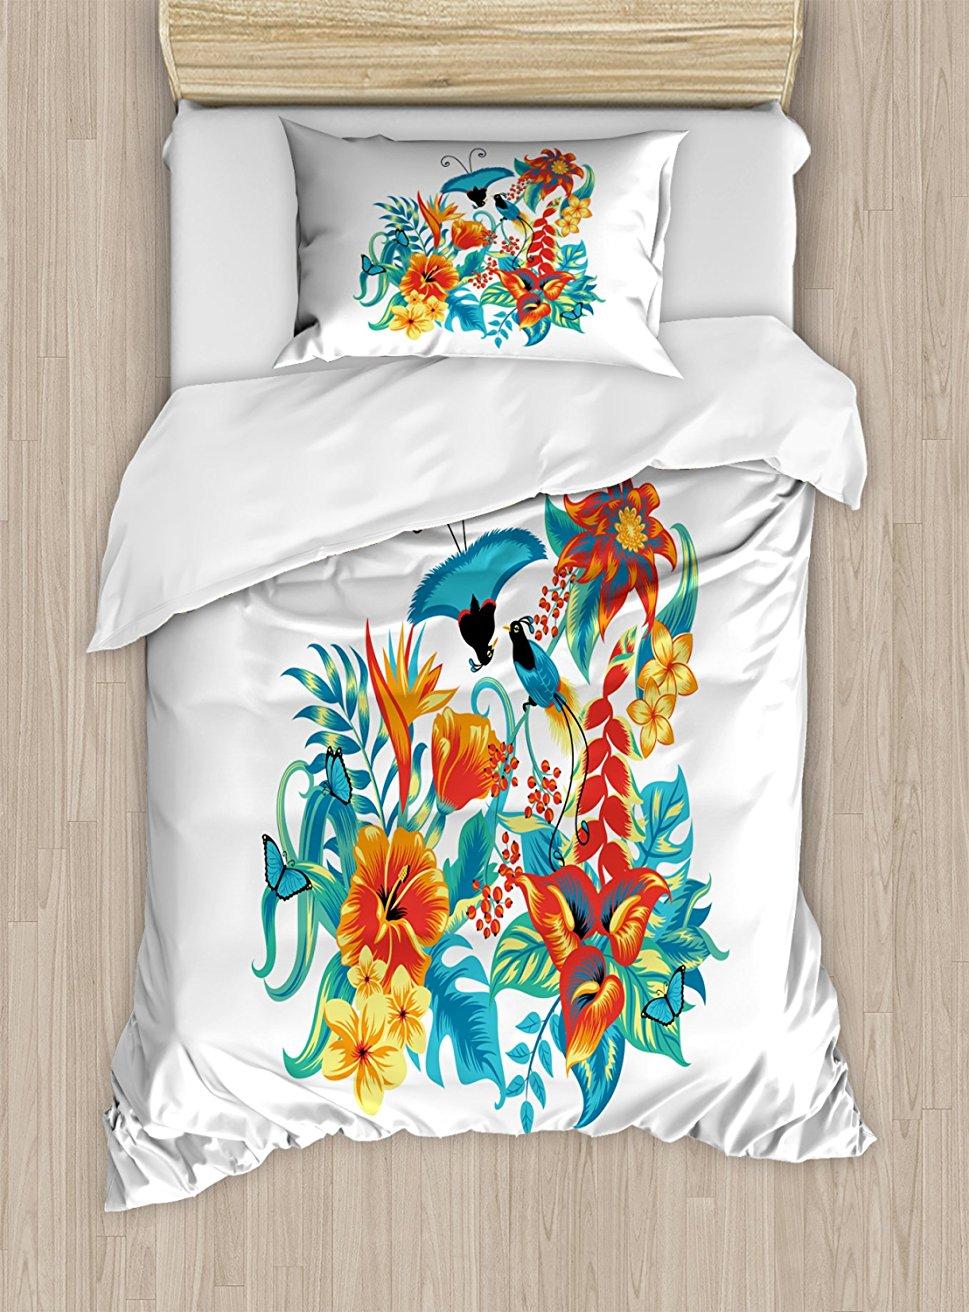 Flowers Duvet Cover Set Tropical Exotic Jungle Foliage with Birds Hawaiian Island Flowers Retro Decorative 4 Piece Bedding Set